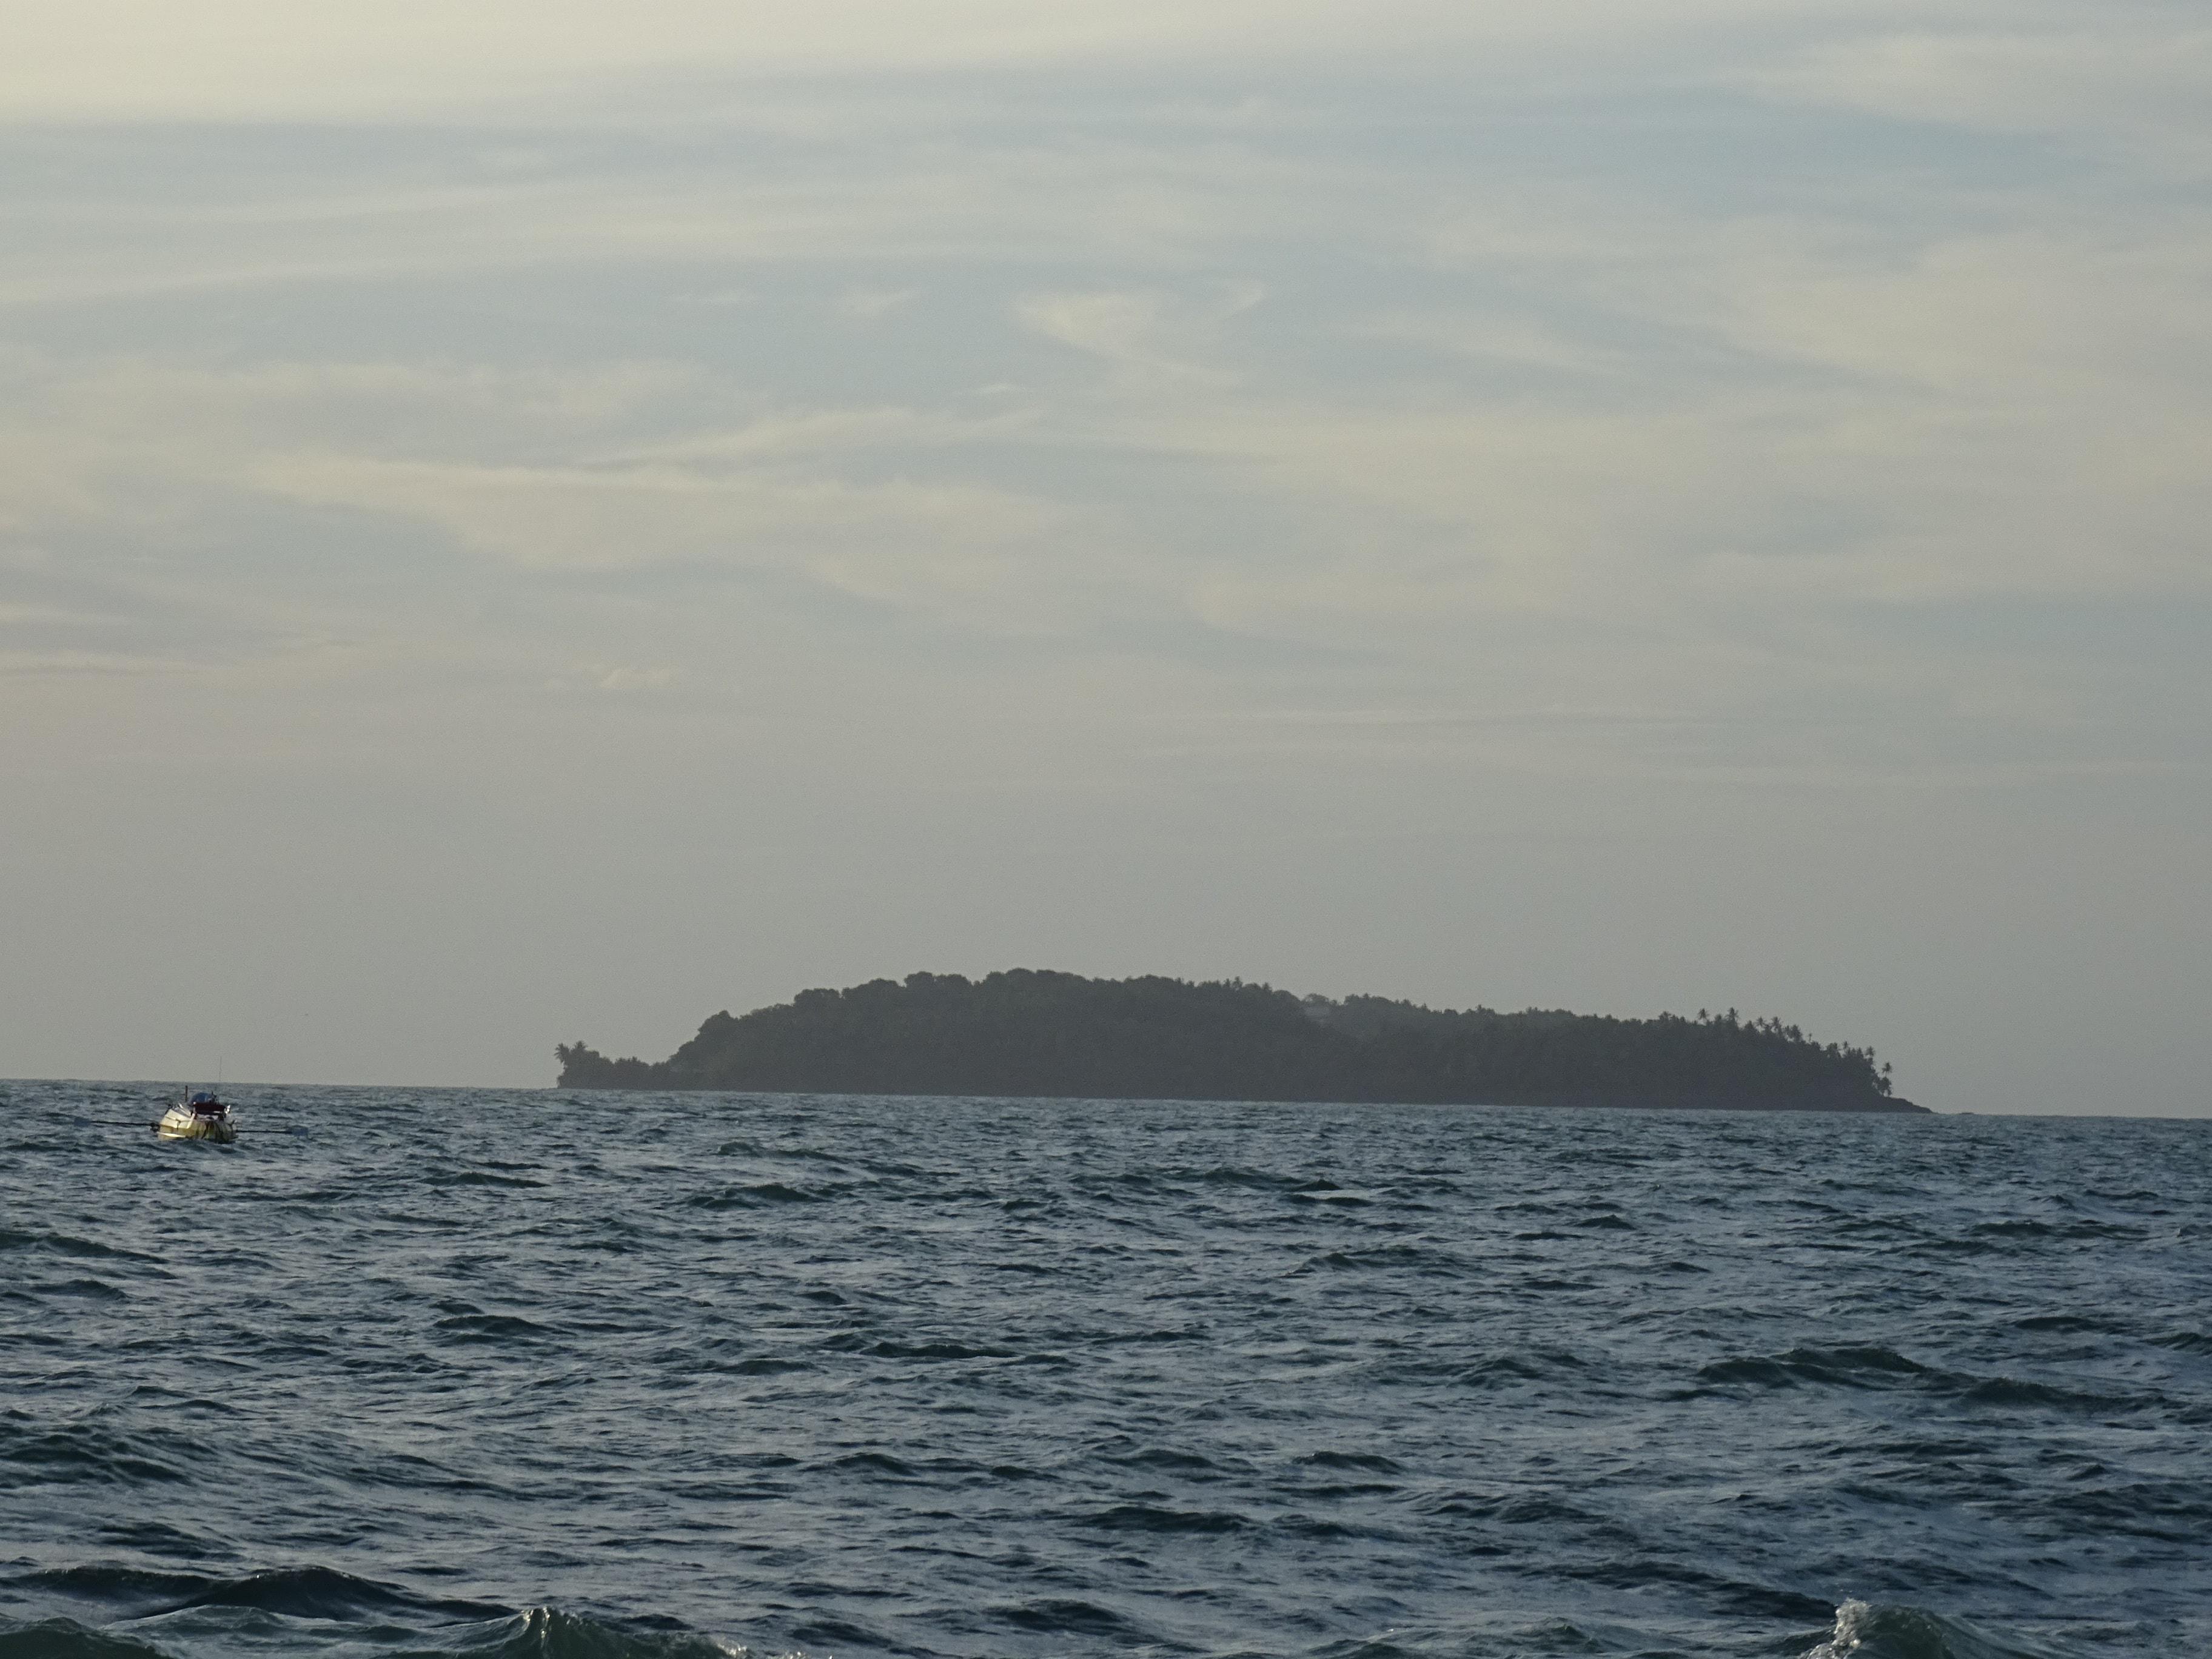 170923-nav cay-kourou (16)-min